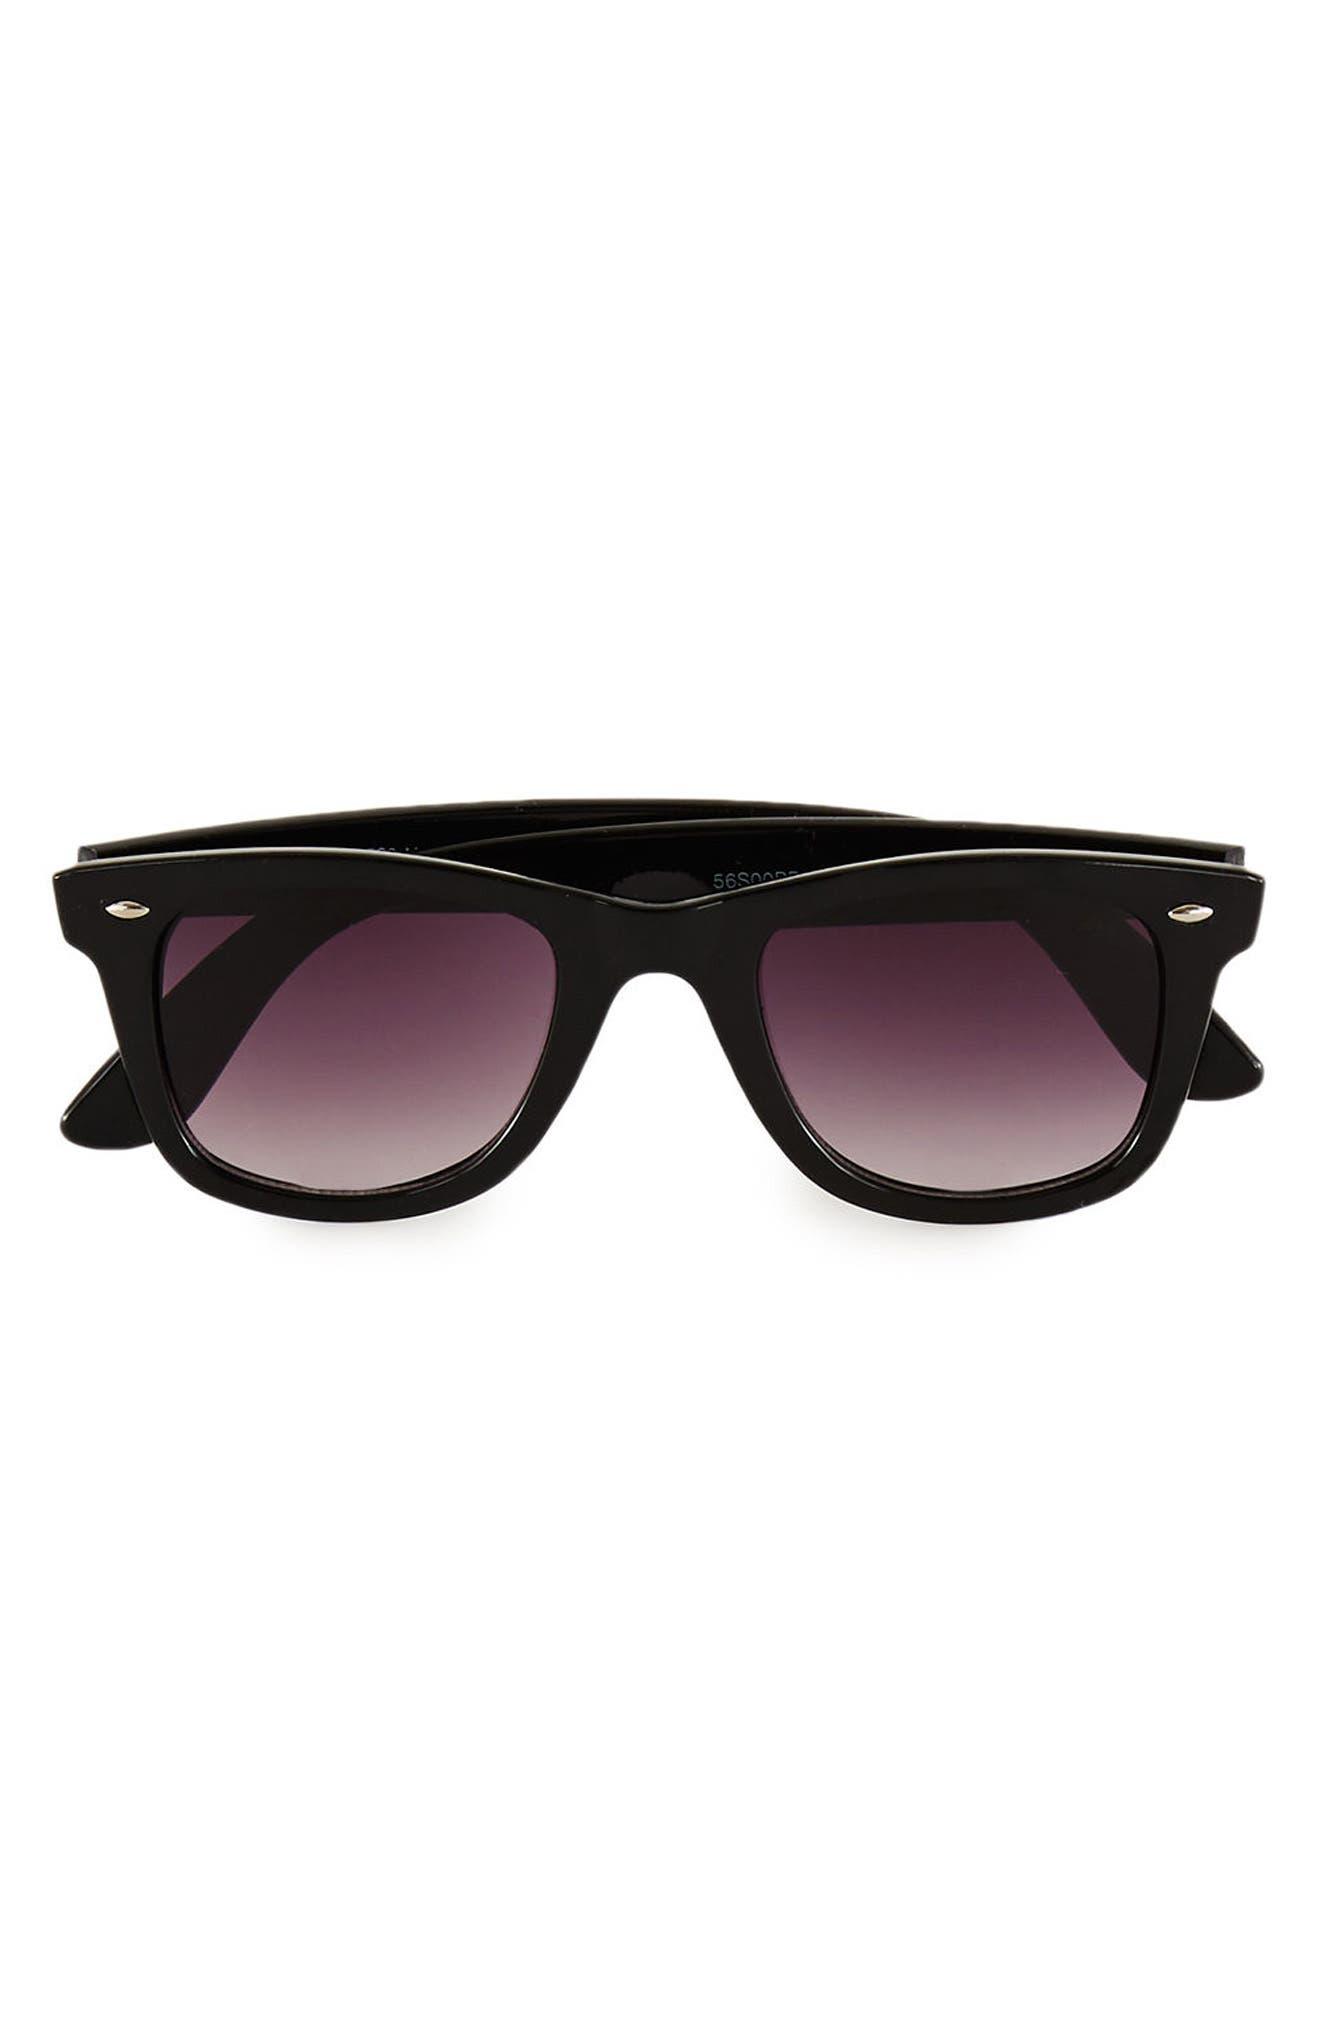 Topman 48mm Round Sunglasses